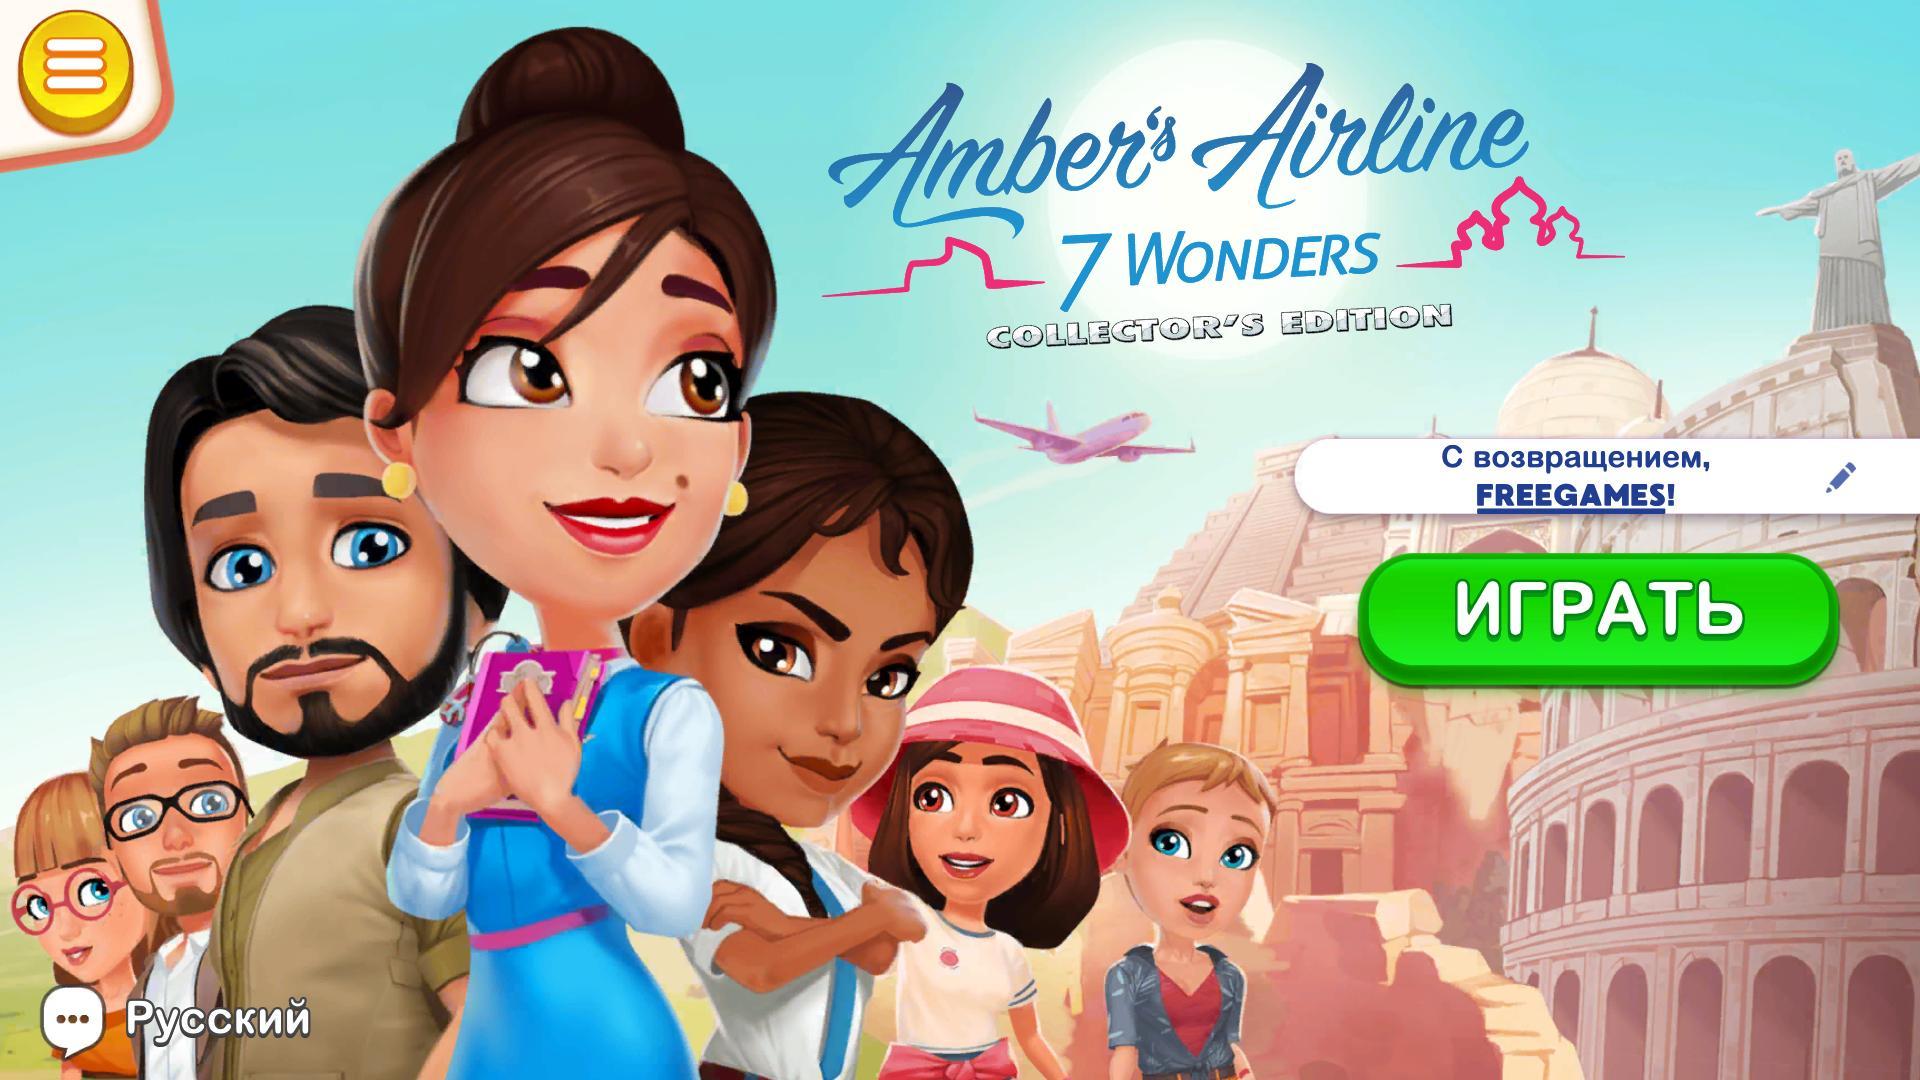 Авиакомпания Эмбер: 7 чудес. Коллекционное издание |  Amber's Airline: 7 Wonders CE Multi (Rus)